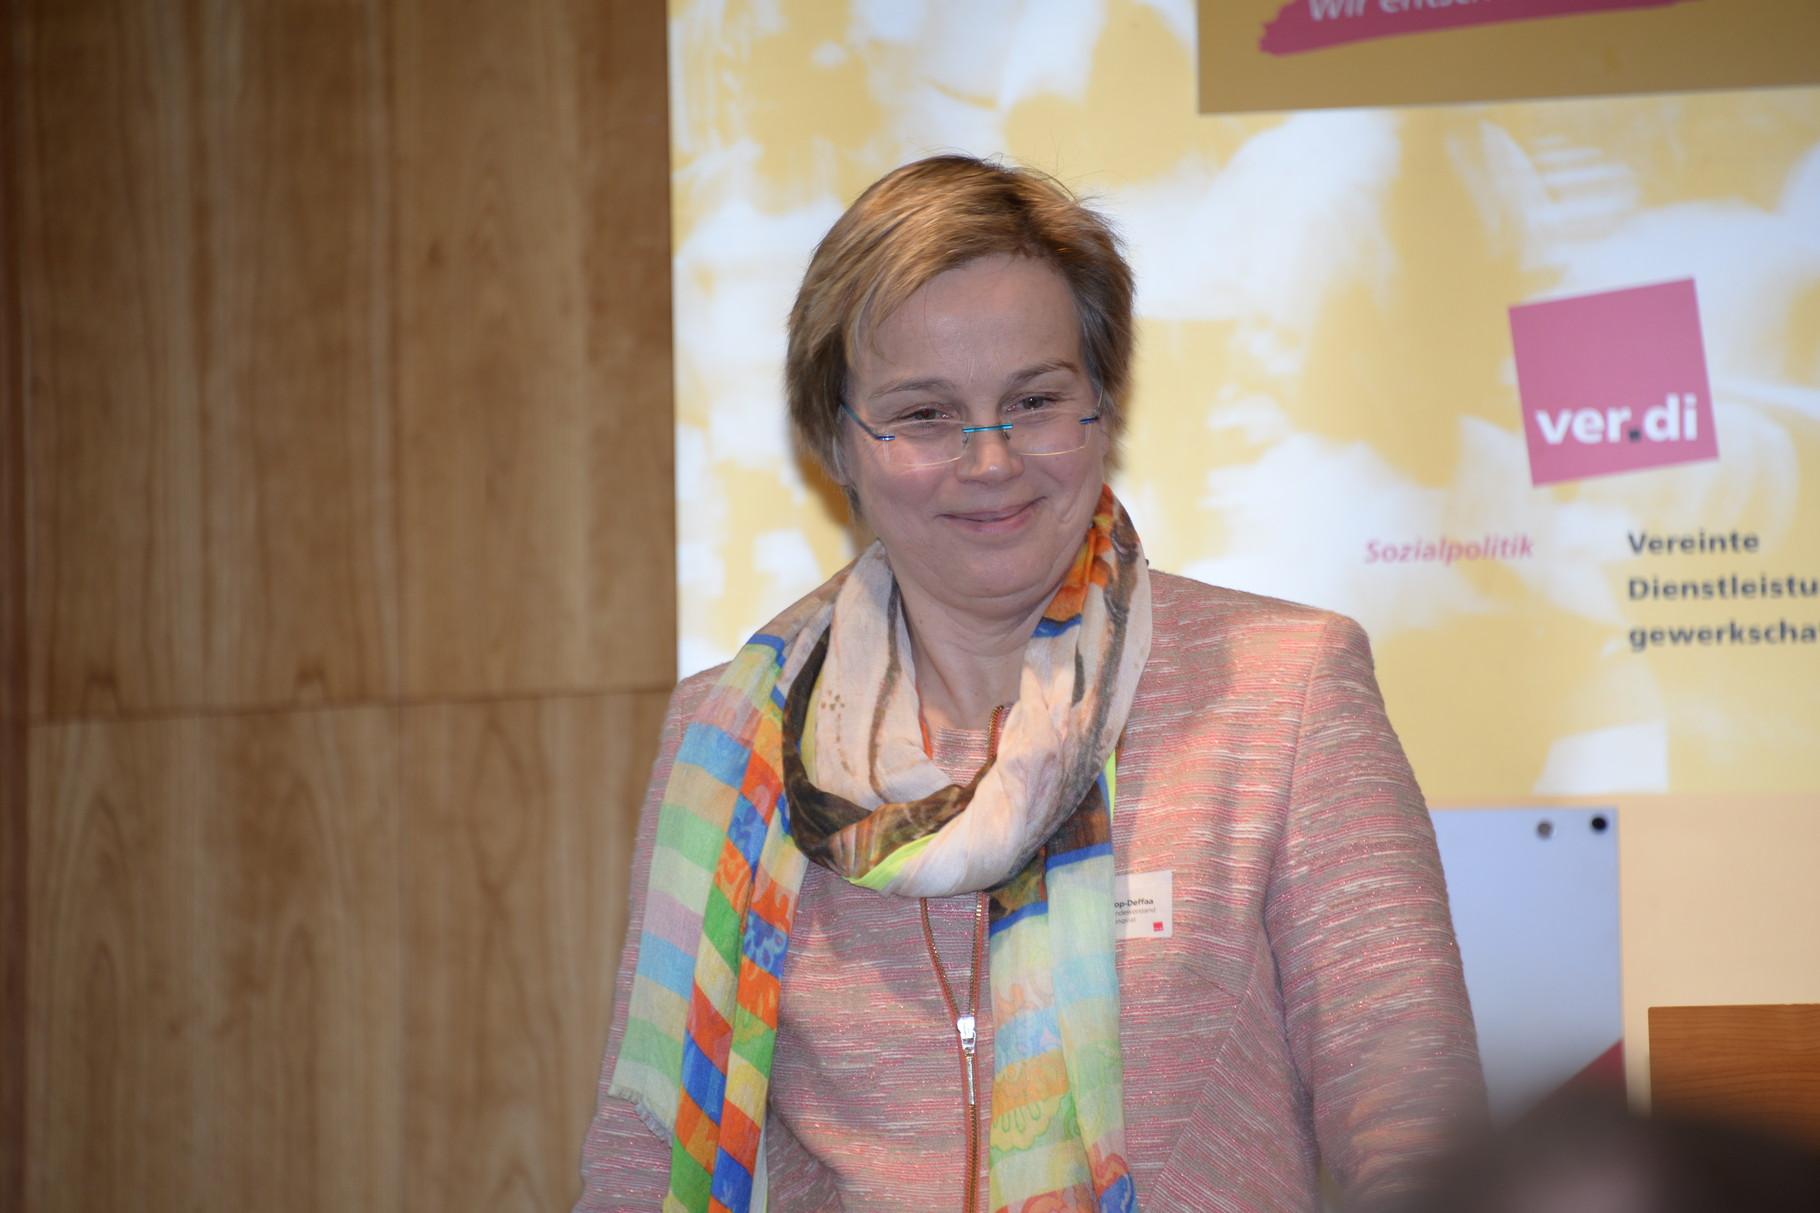 Eva Maria Welskop-Deffaa, ver.di Bundesvorstand